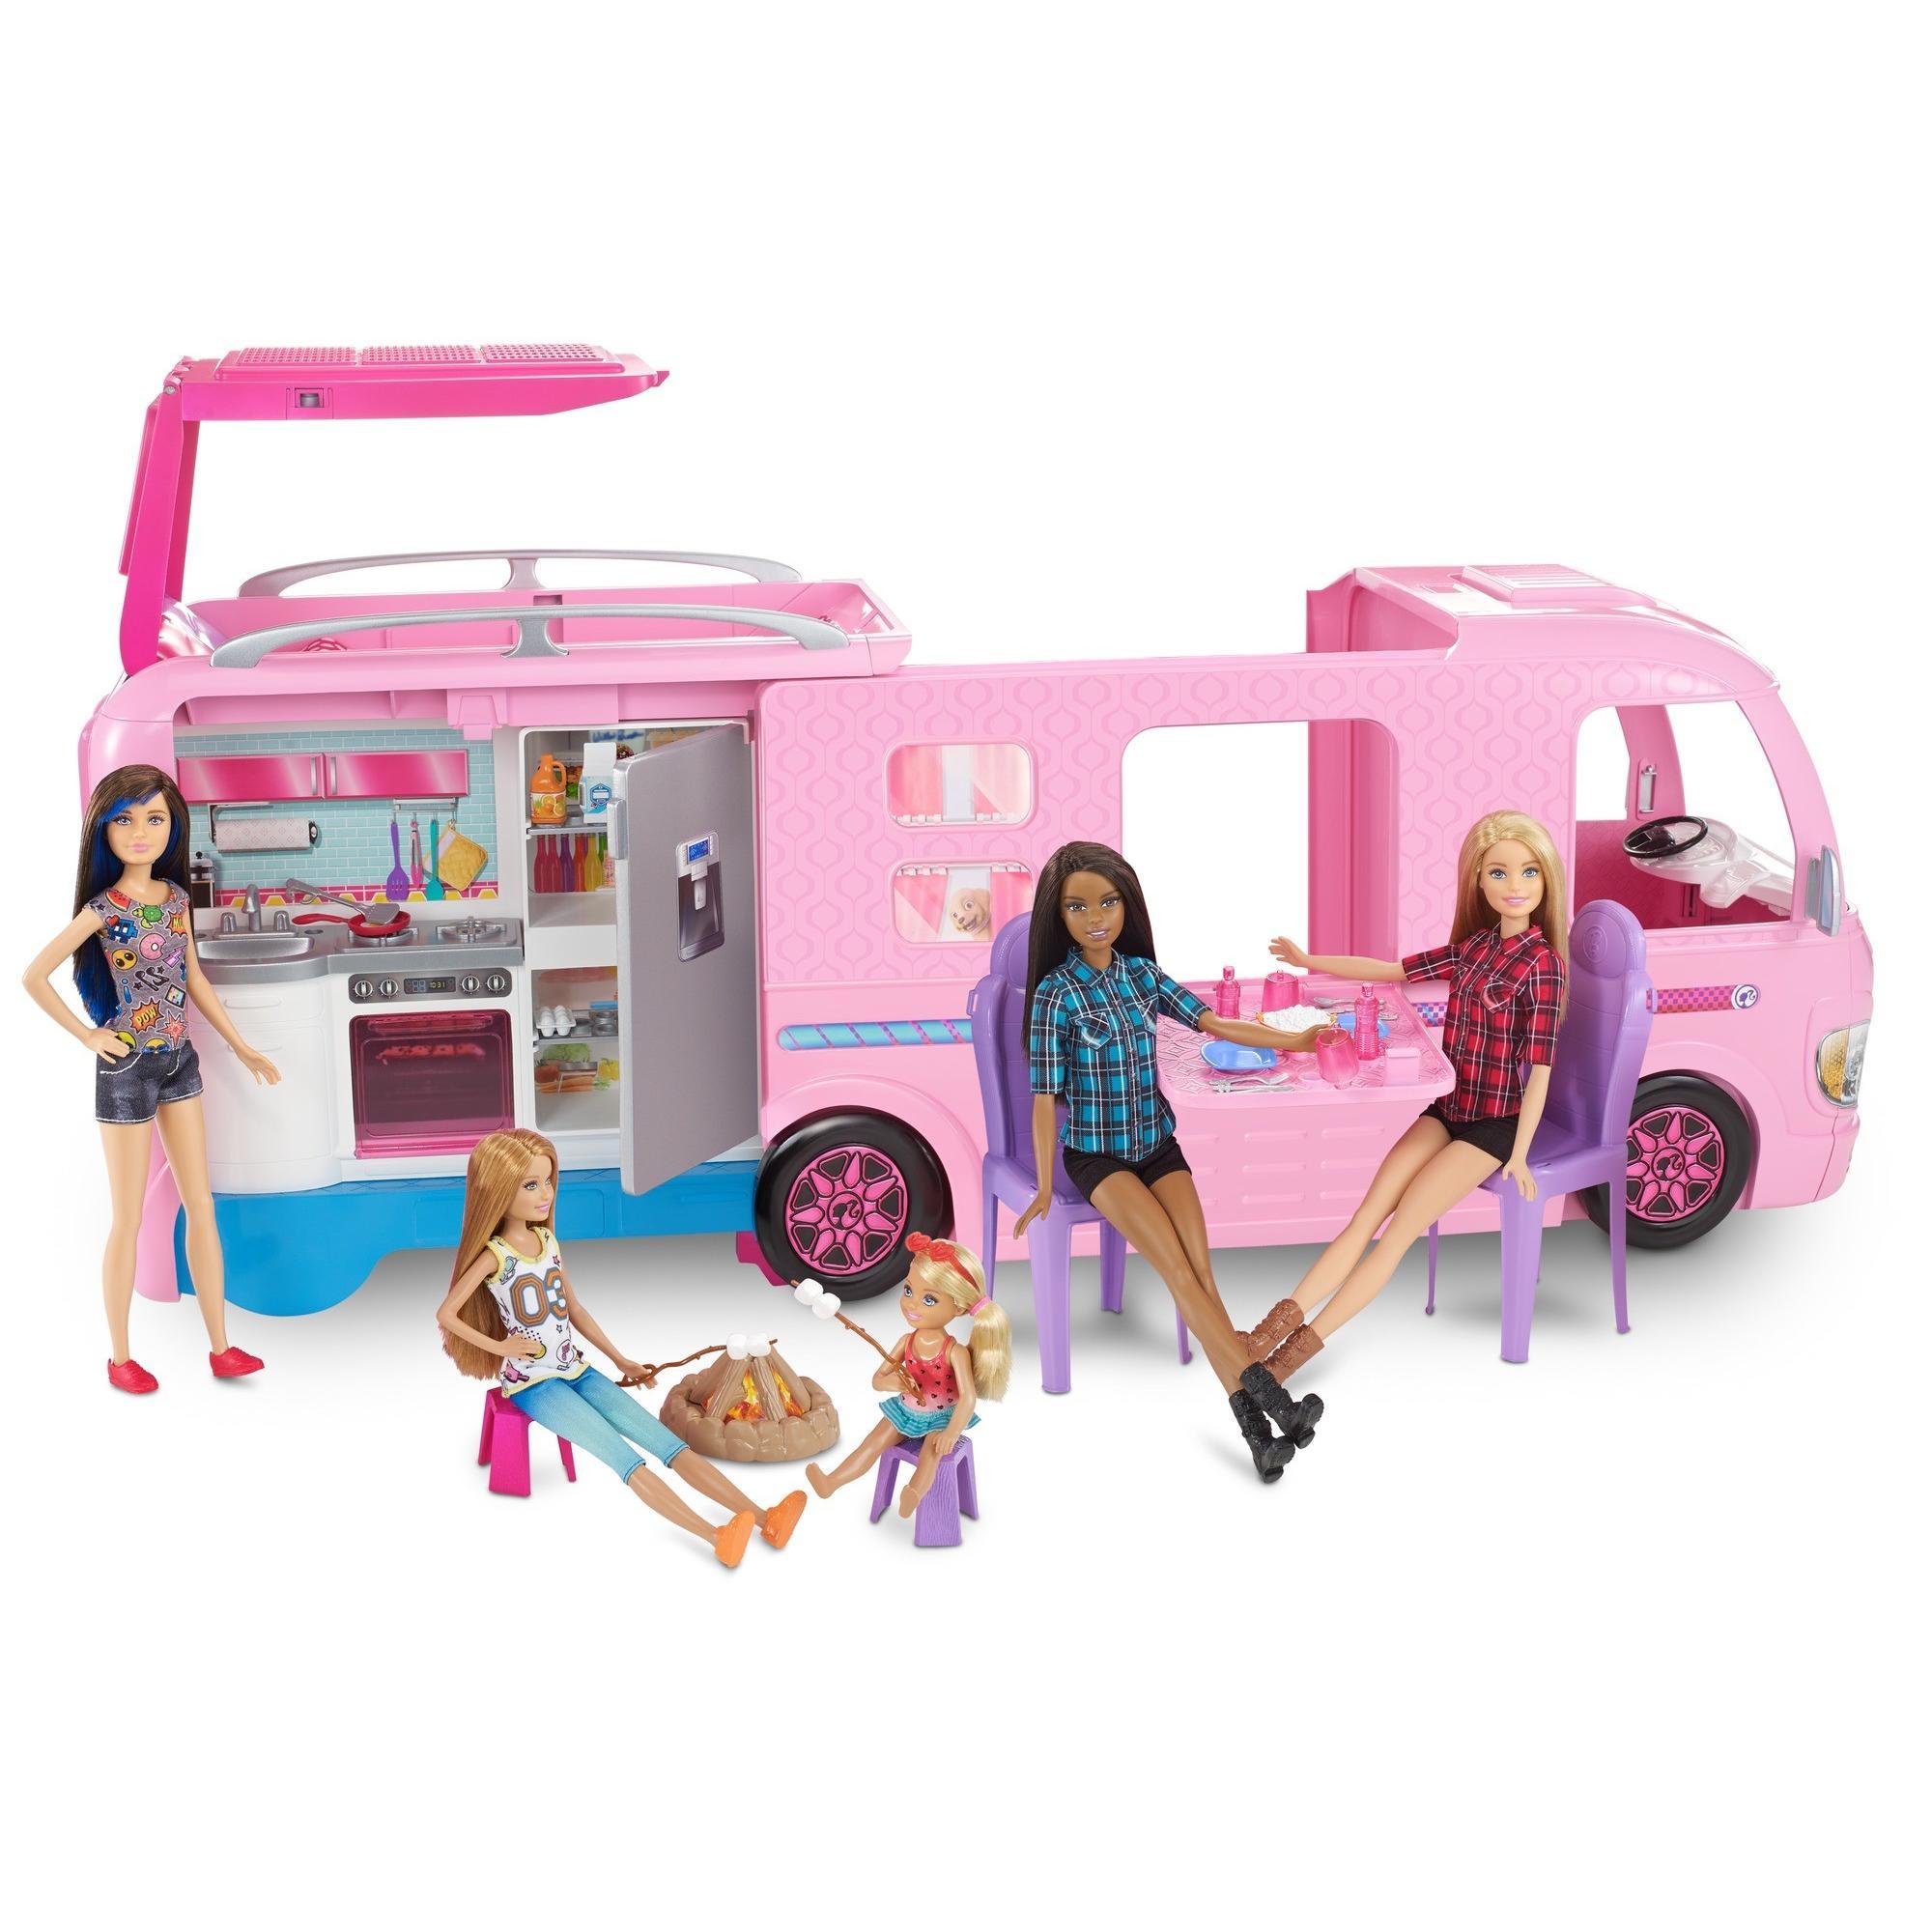 fecae8e173e Barbie DreamCamper Adventure Camping Playset with Accessories - Walmart.com